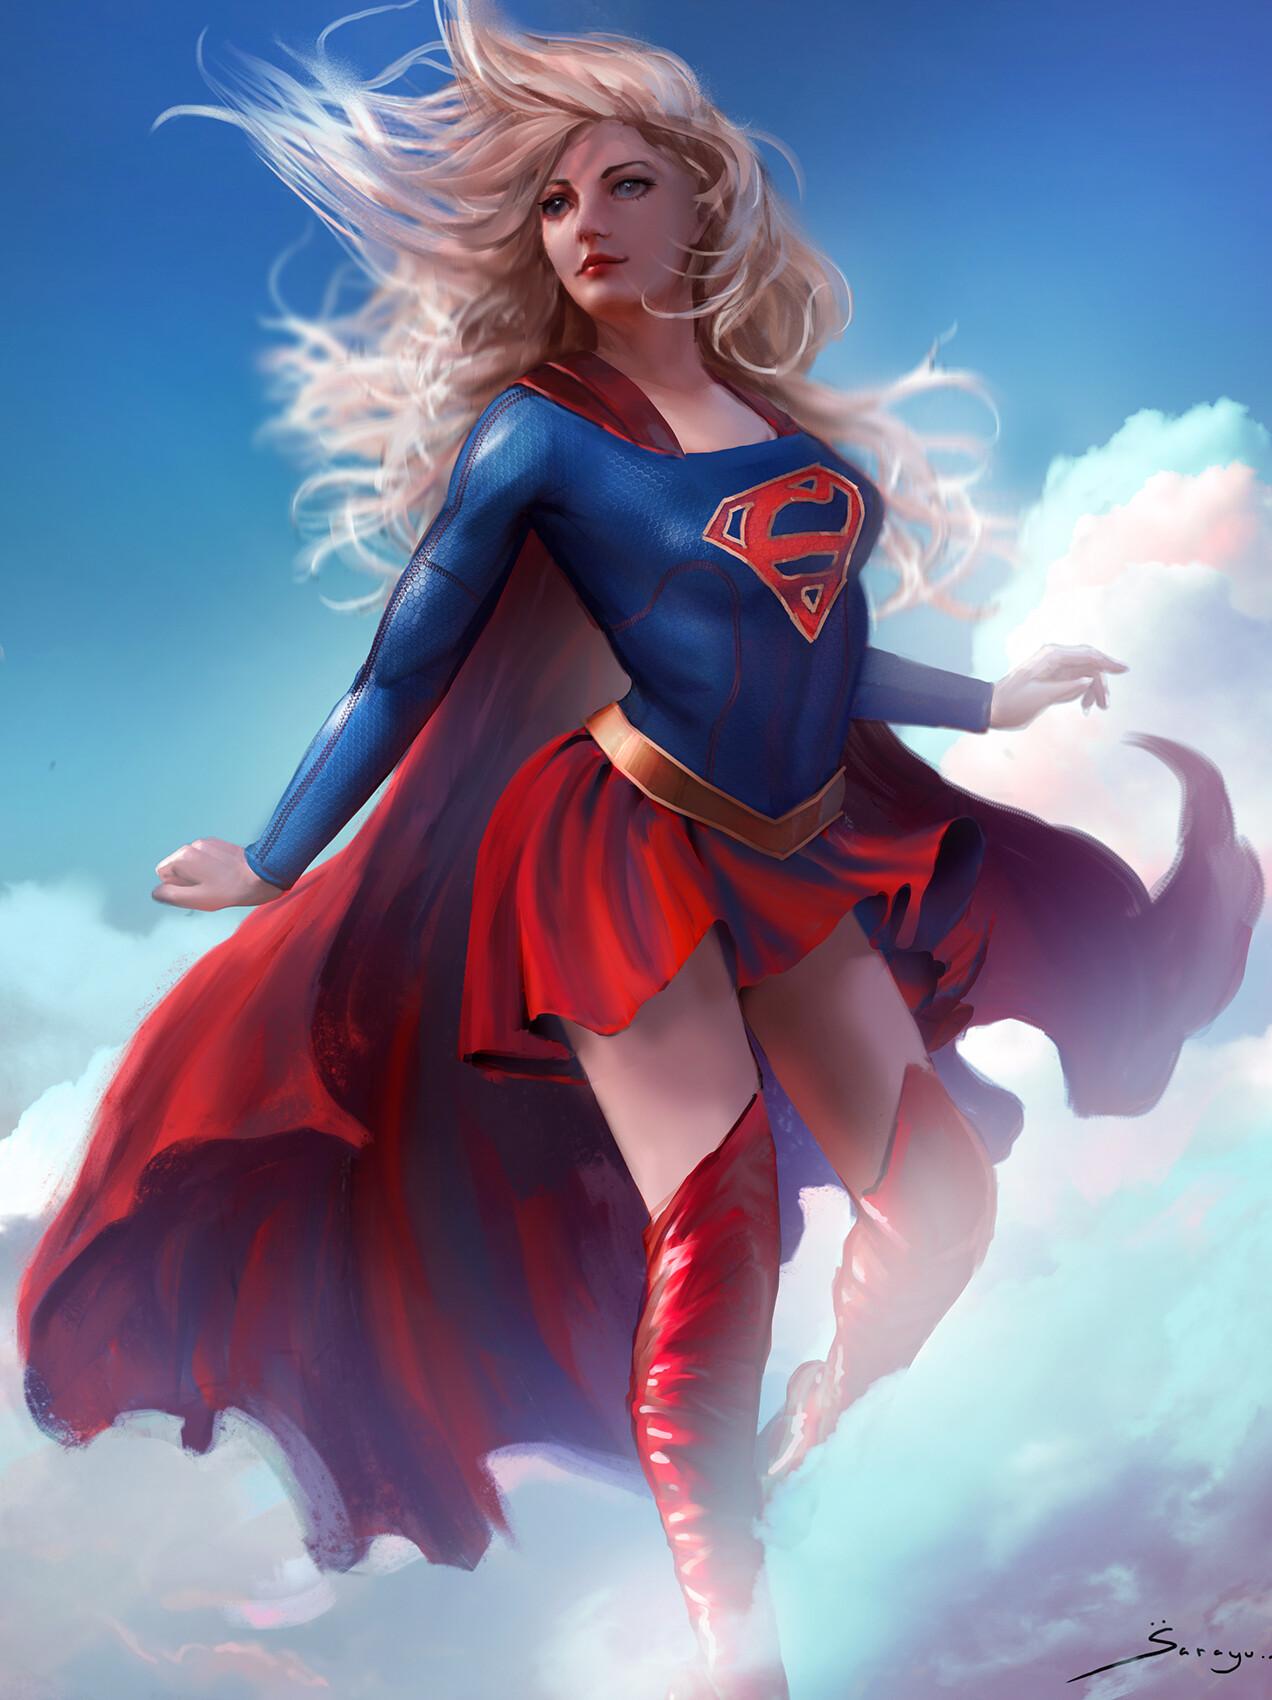 рно картинки супергерл так понравилось